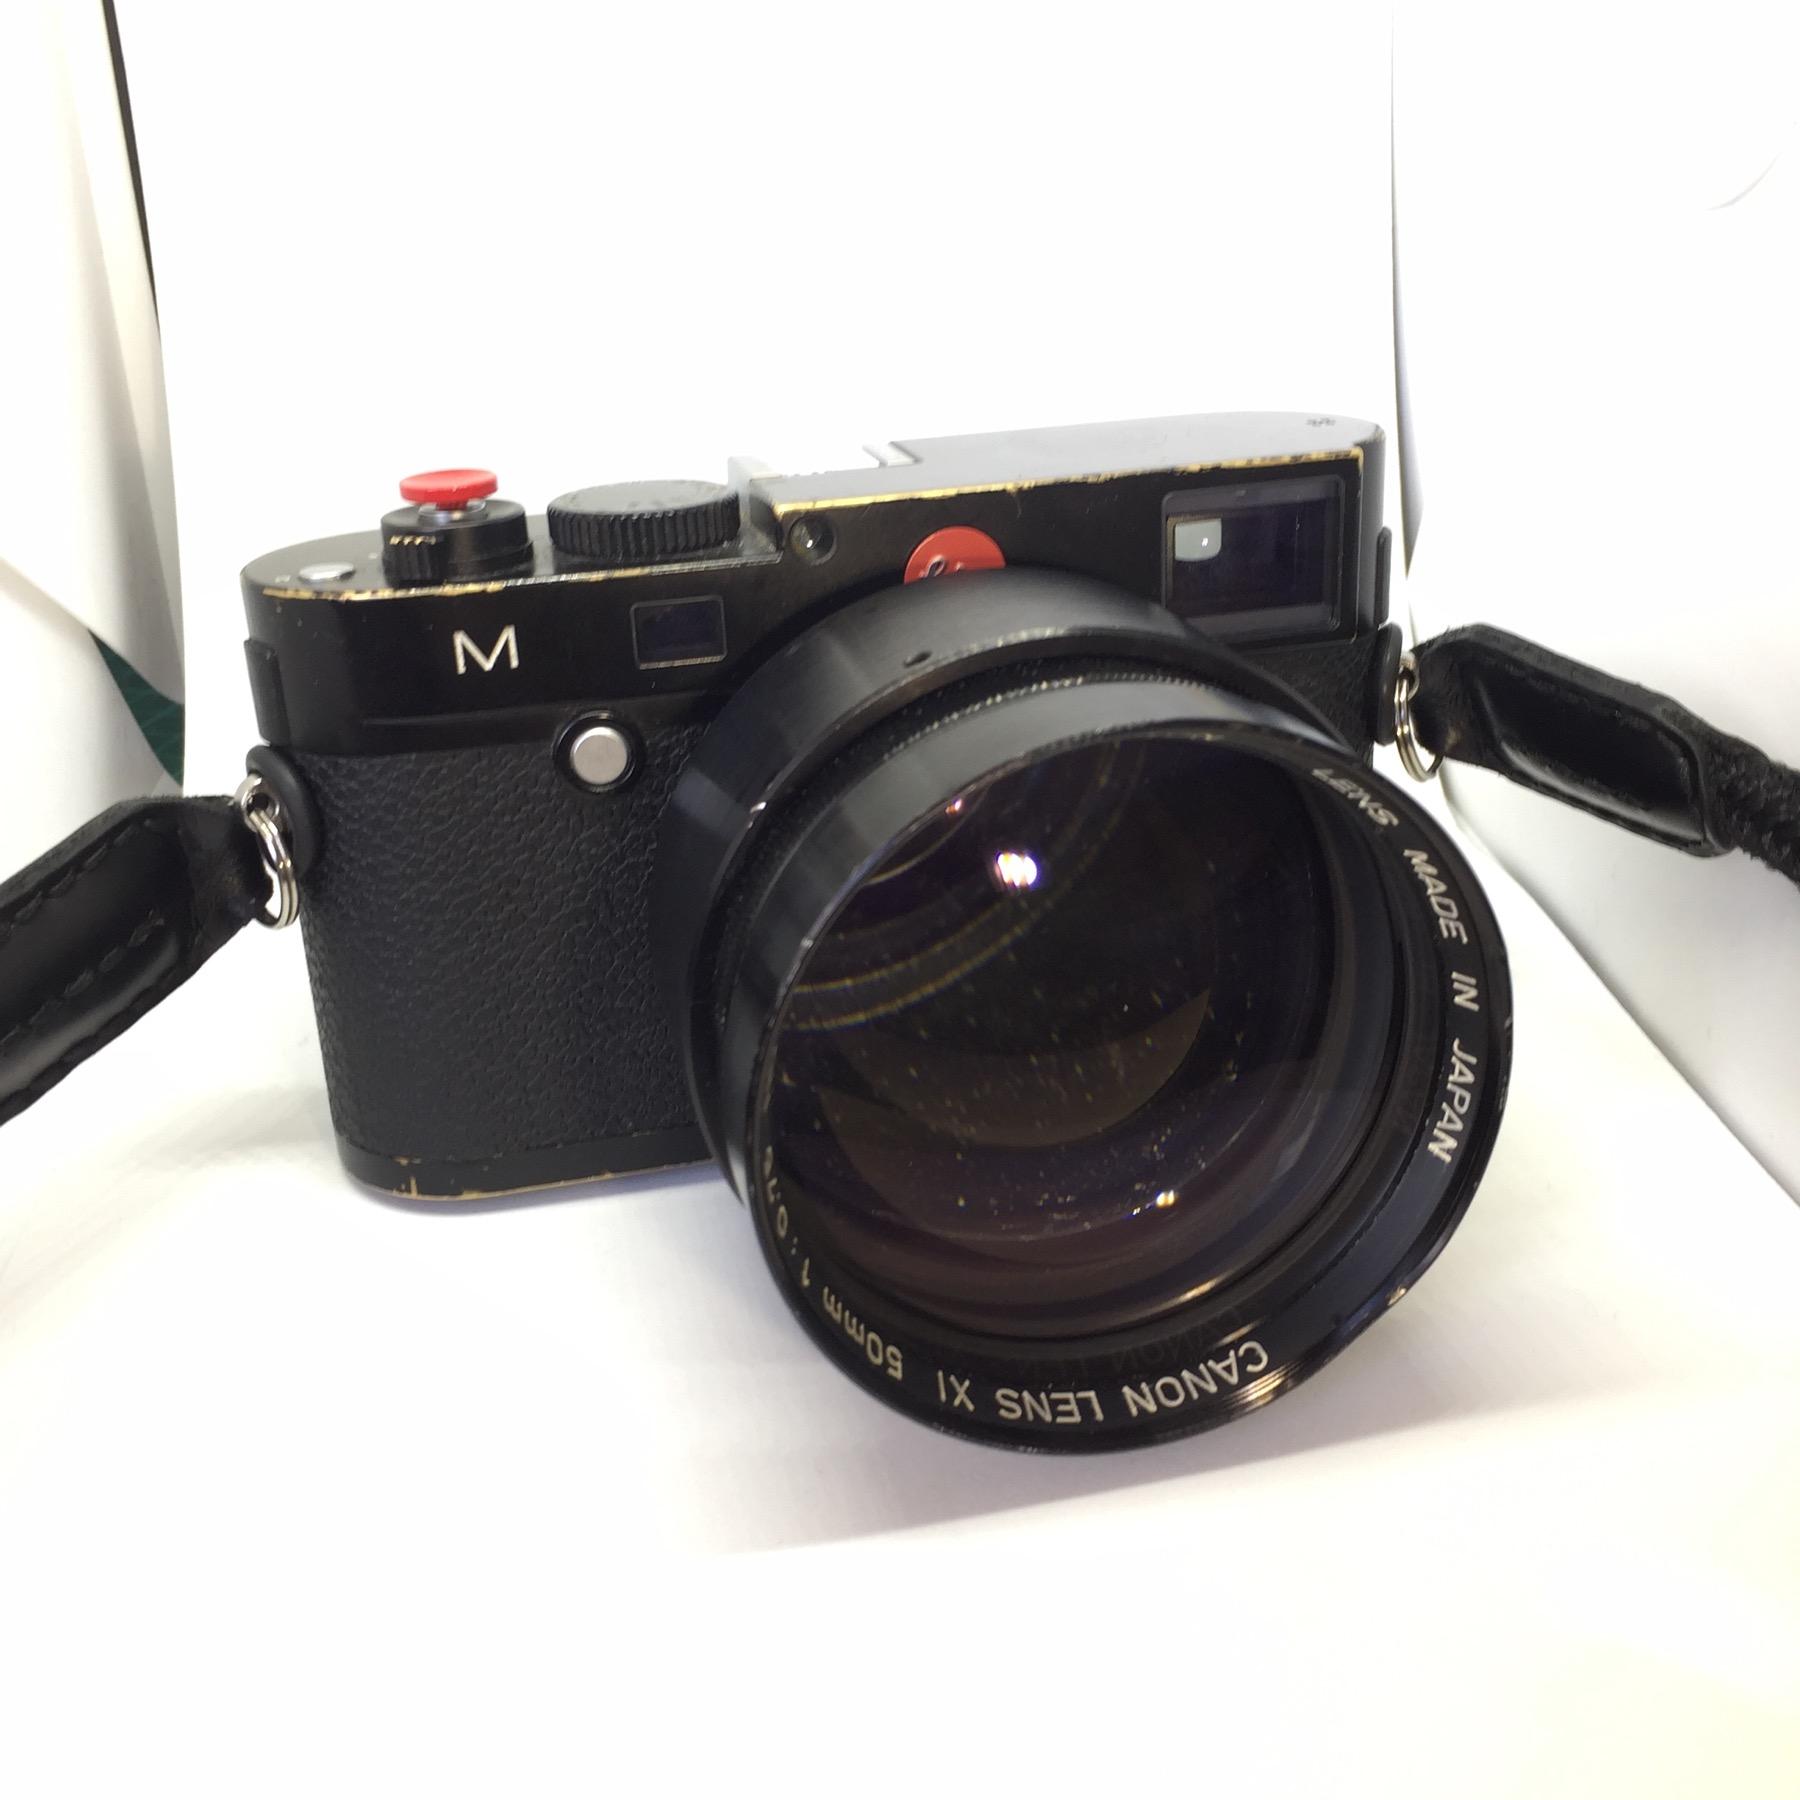 Leica M Canon 50mm f0.75 XI lens